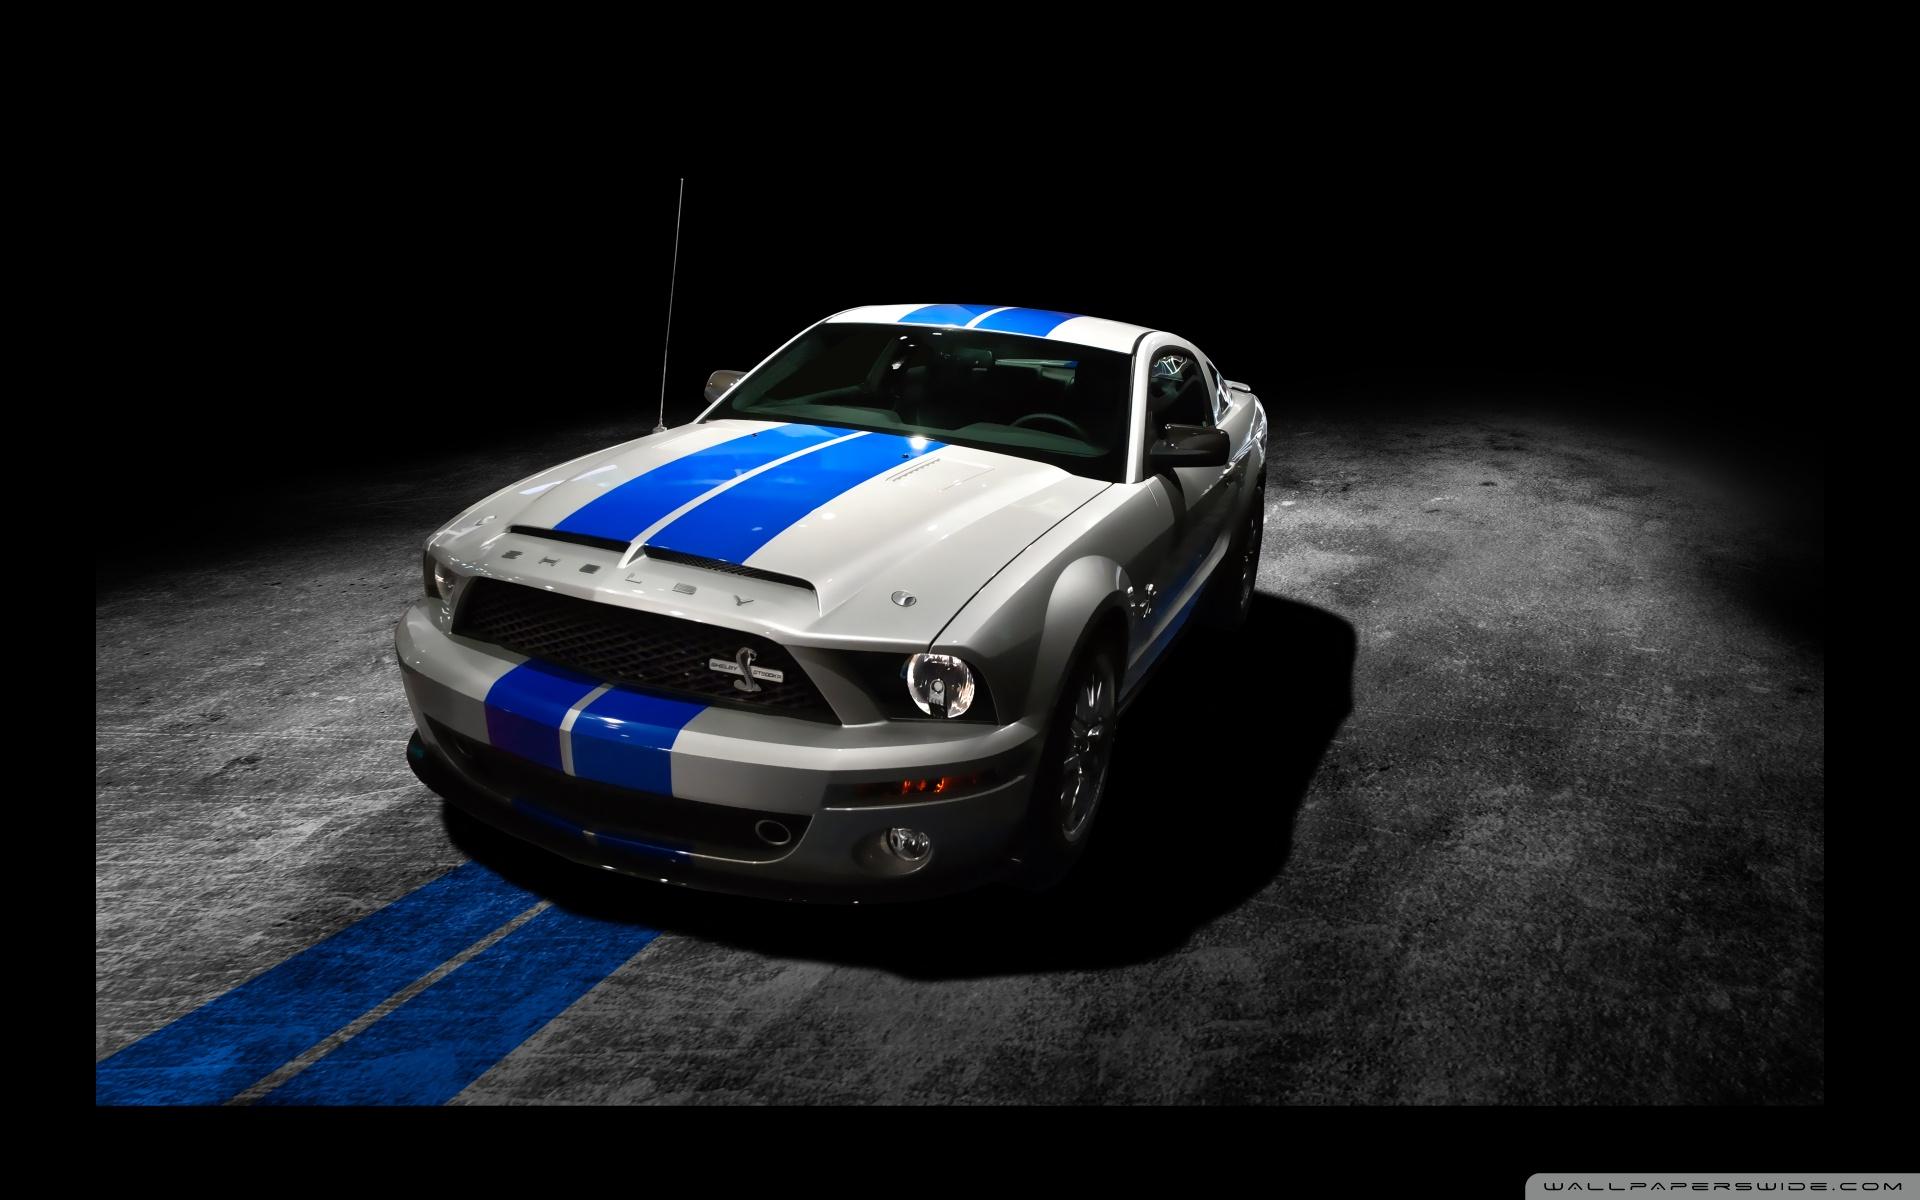 Ford Mustang - hot-new-movies-cars Wallpaper